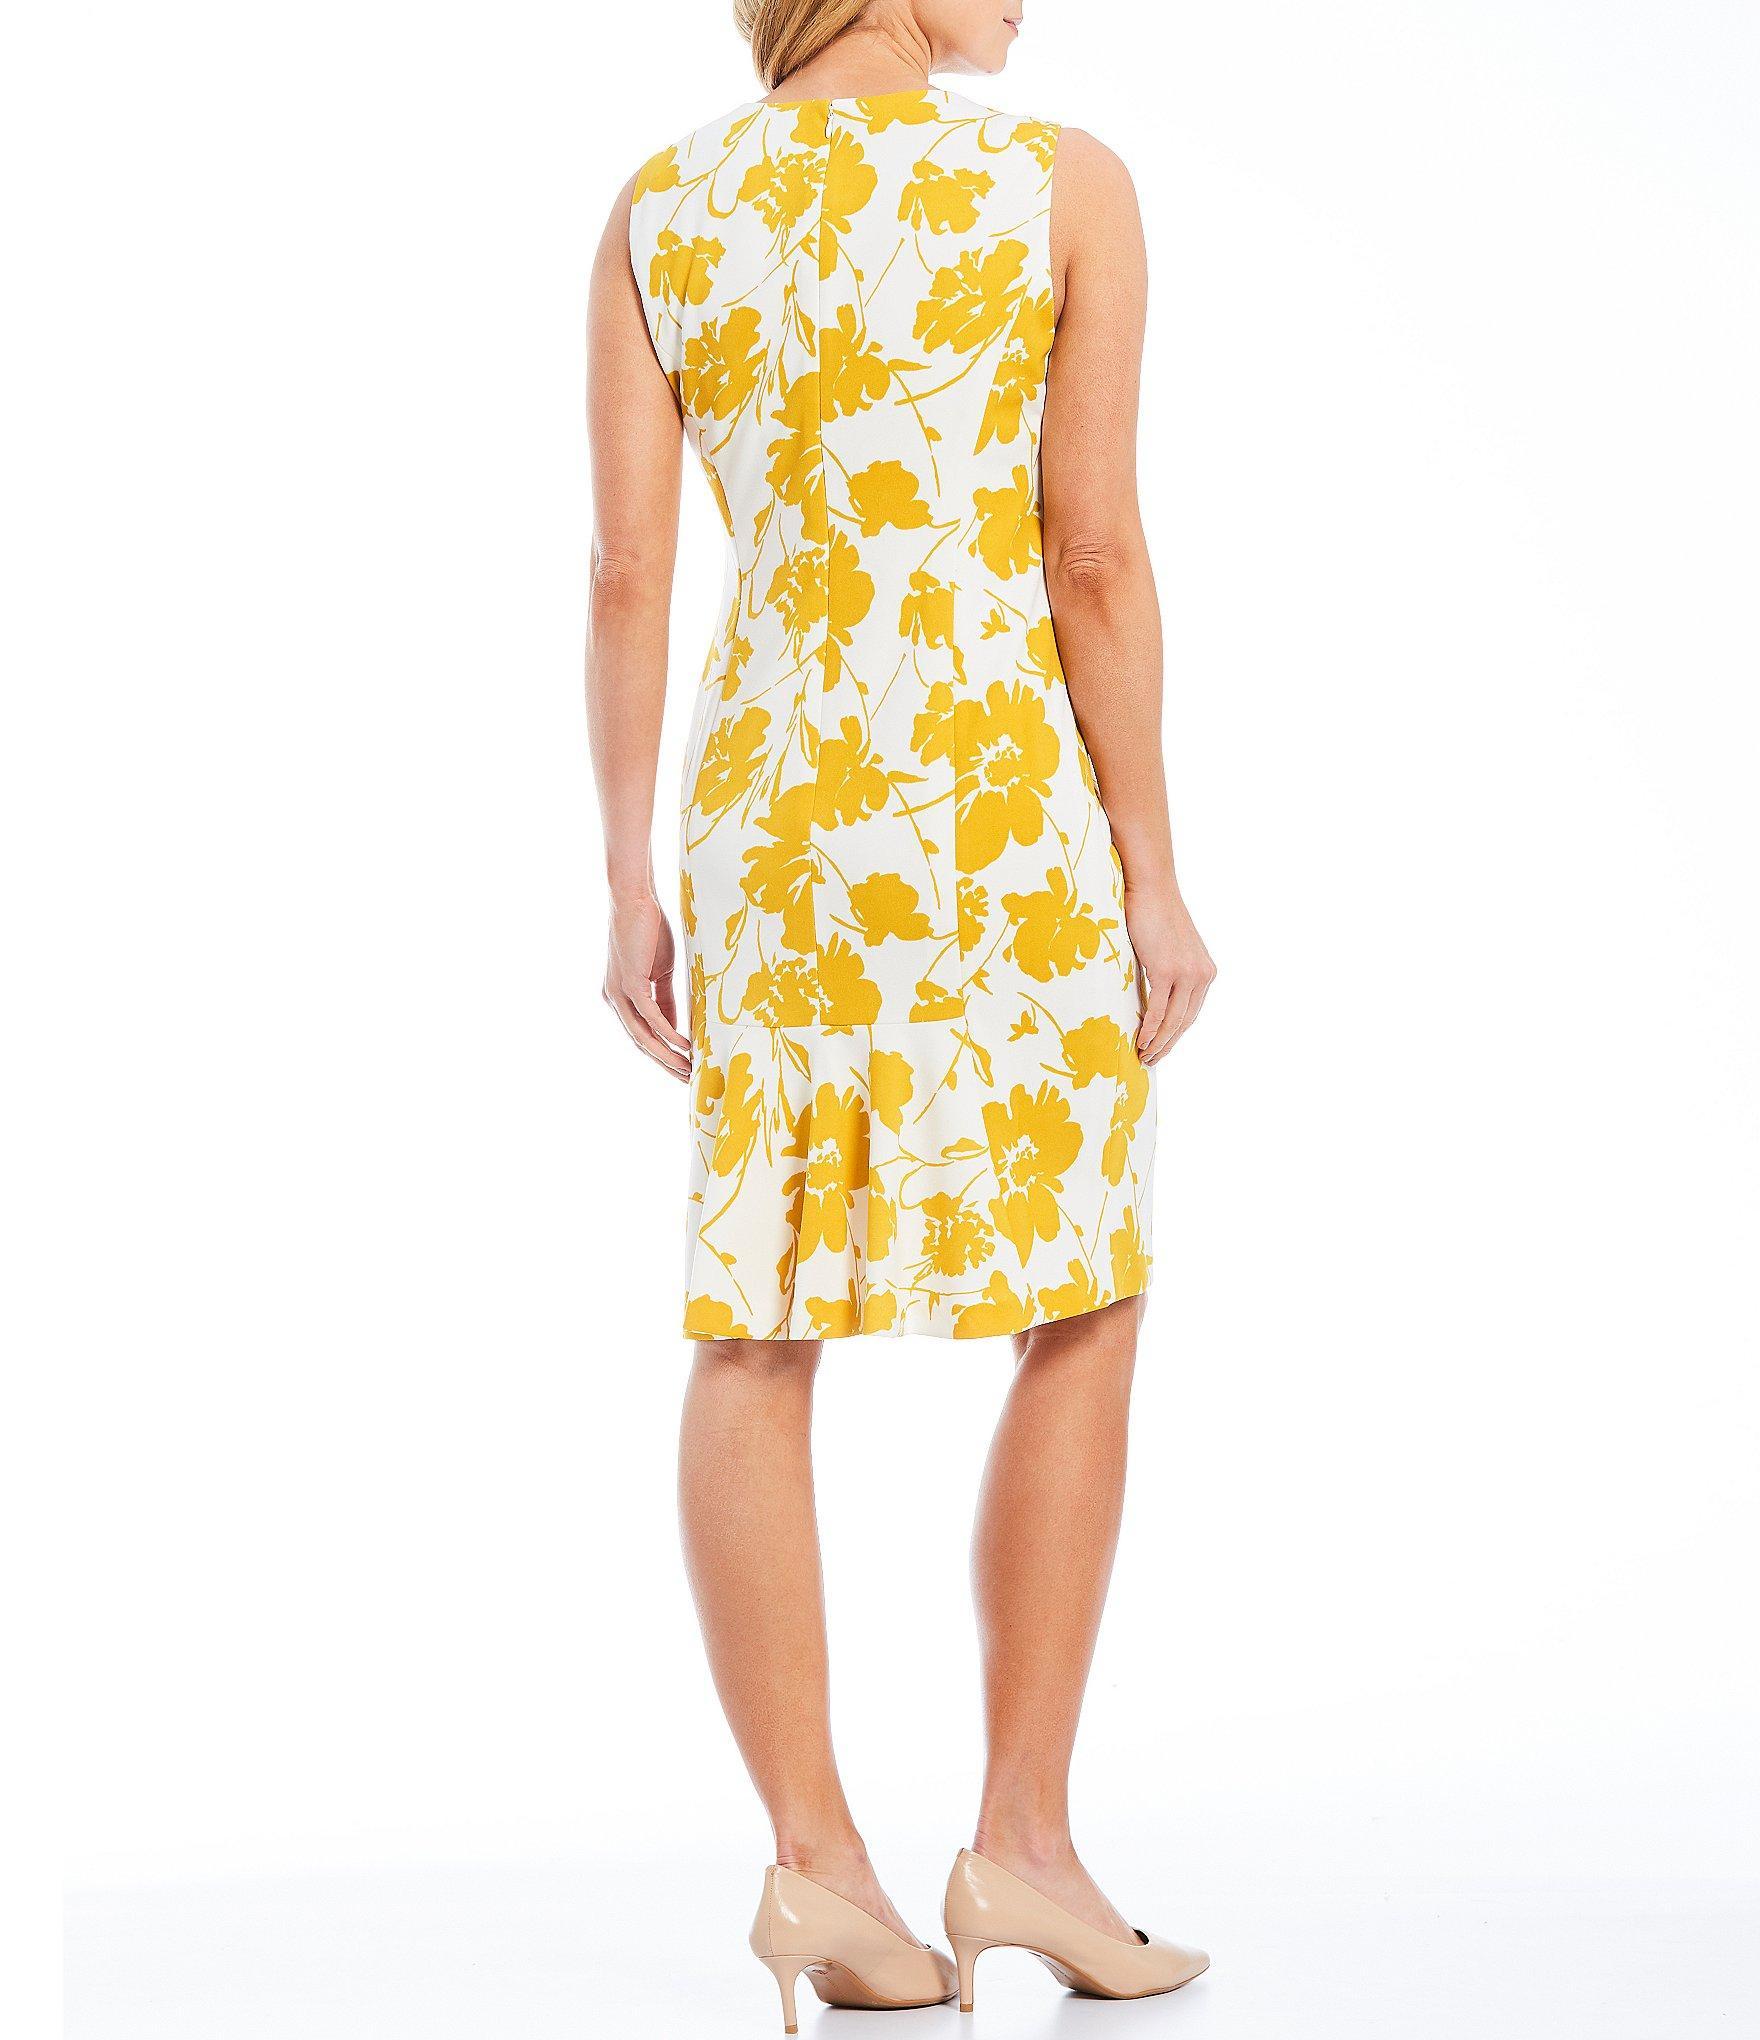 b5e97a68b6e Kasper - Yellow Floral Print Crepe Square Neck Sheath Dress - Lyst. View  fullscreen